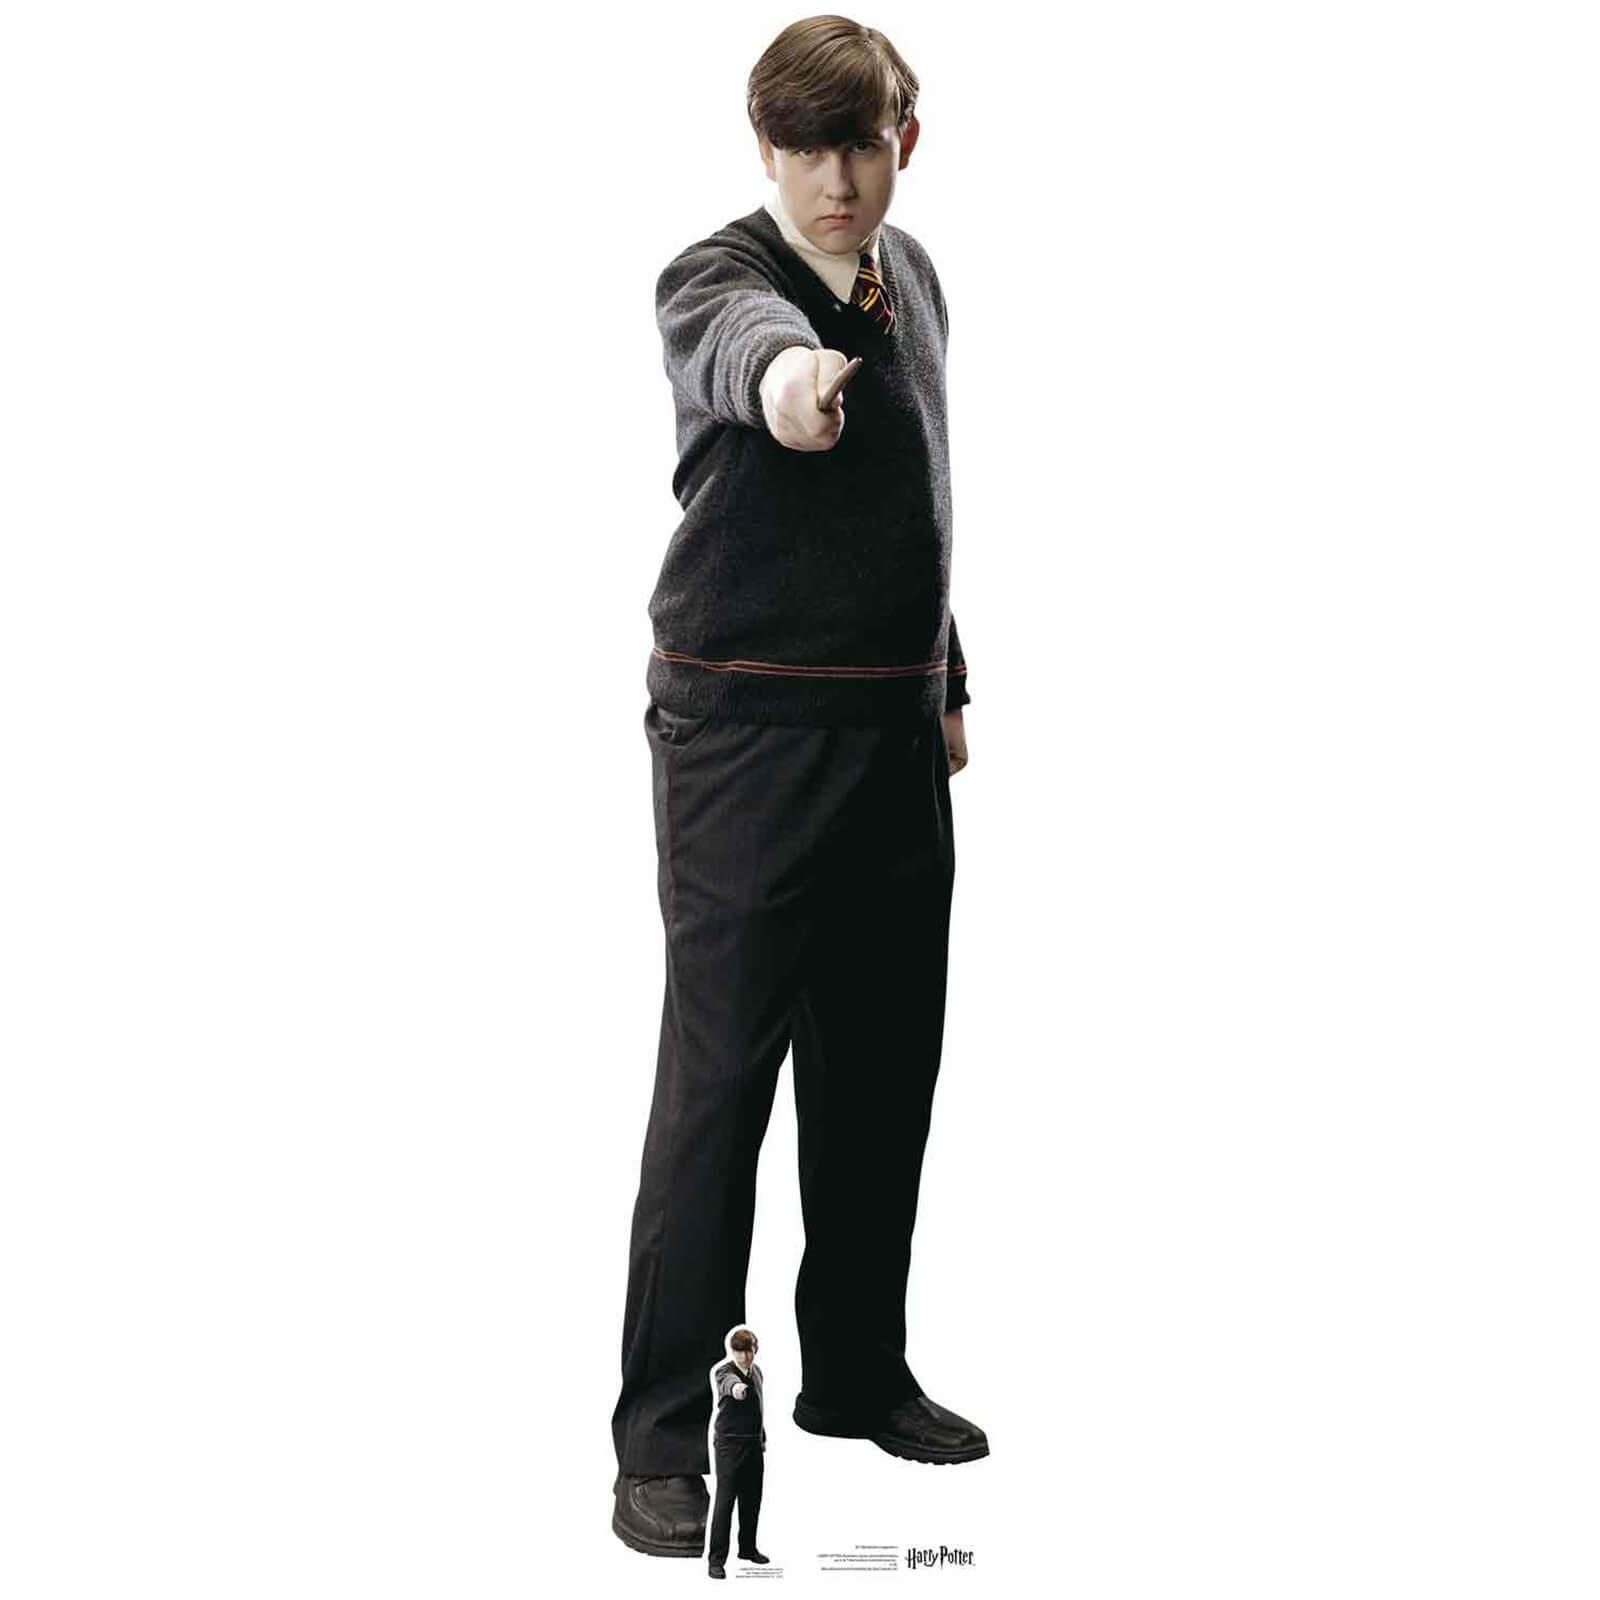 Neville Longbottom Life Sized Cut Out